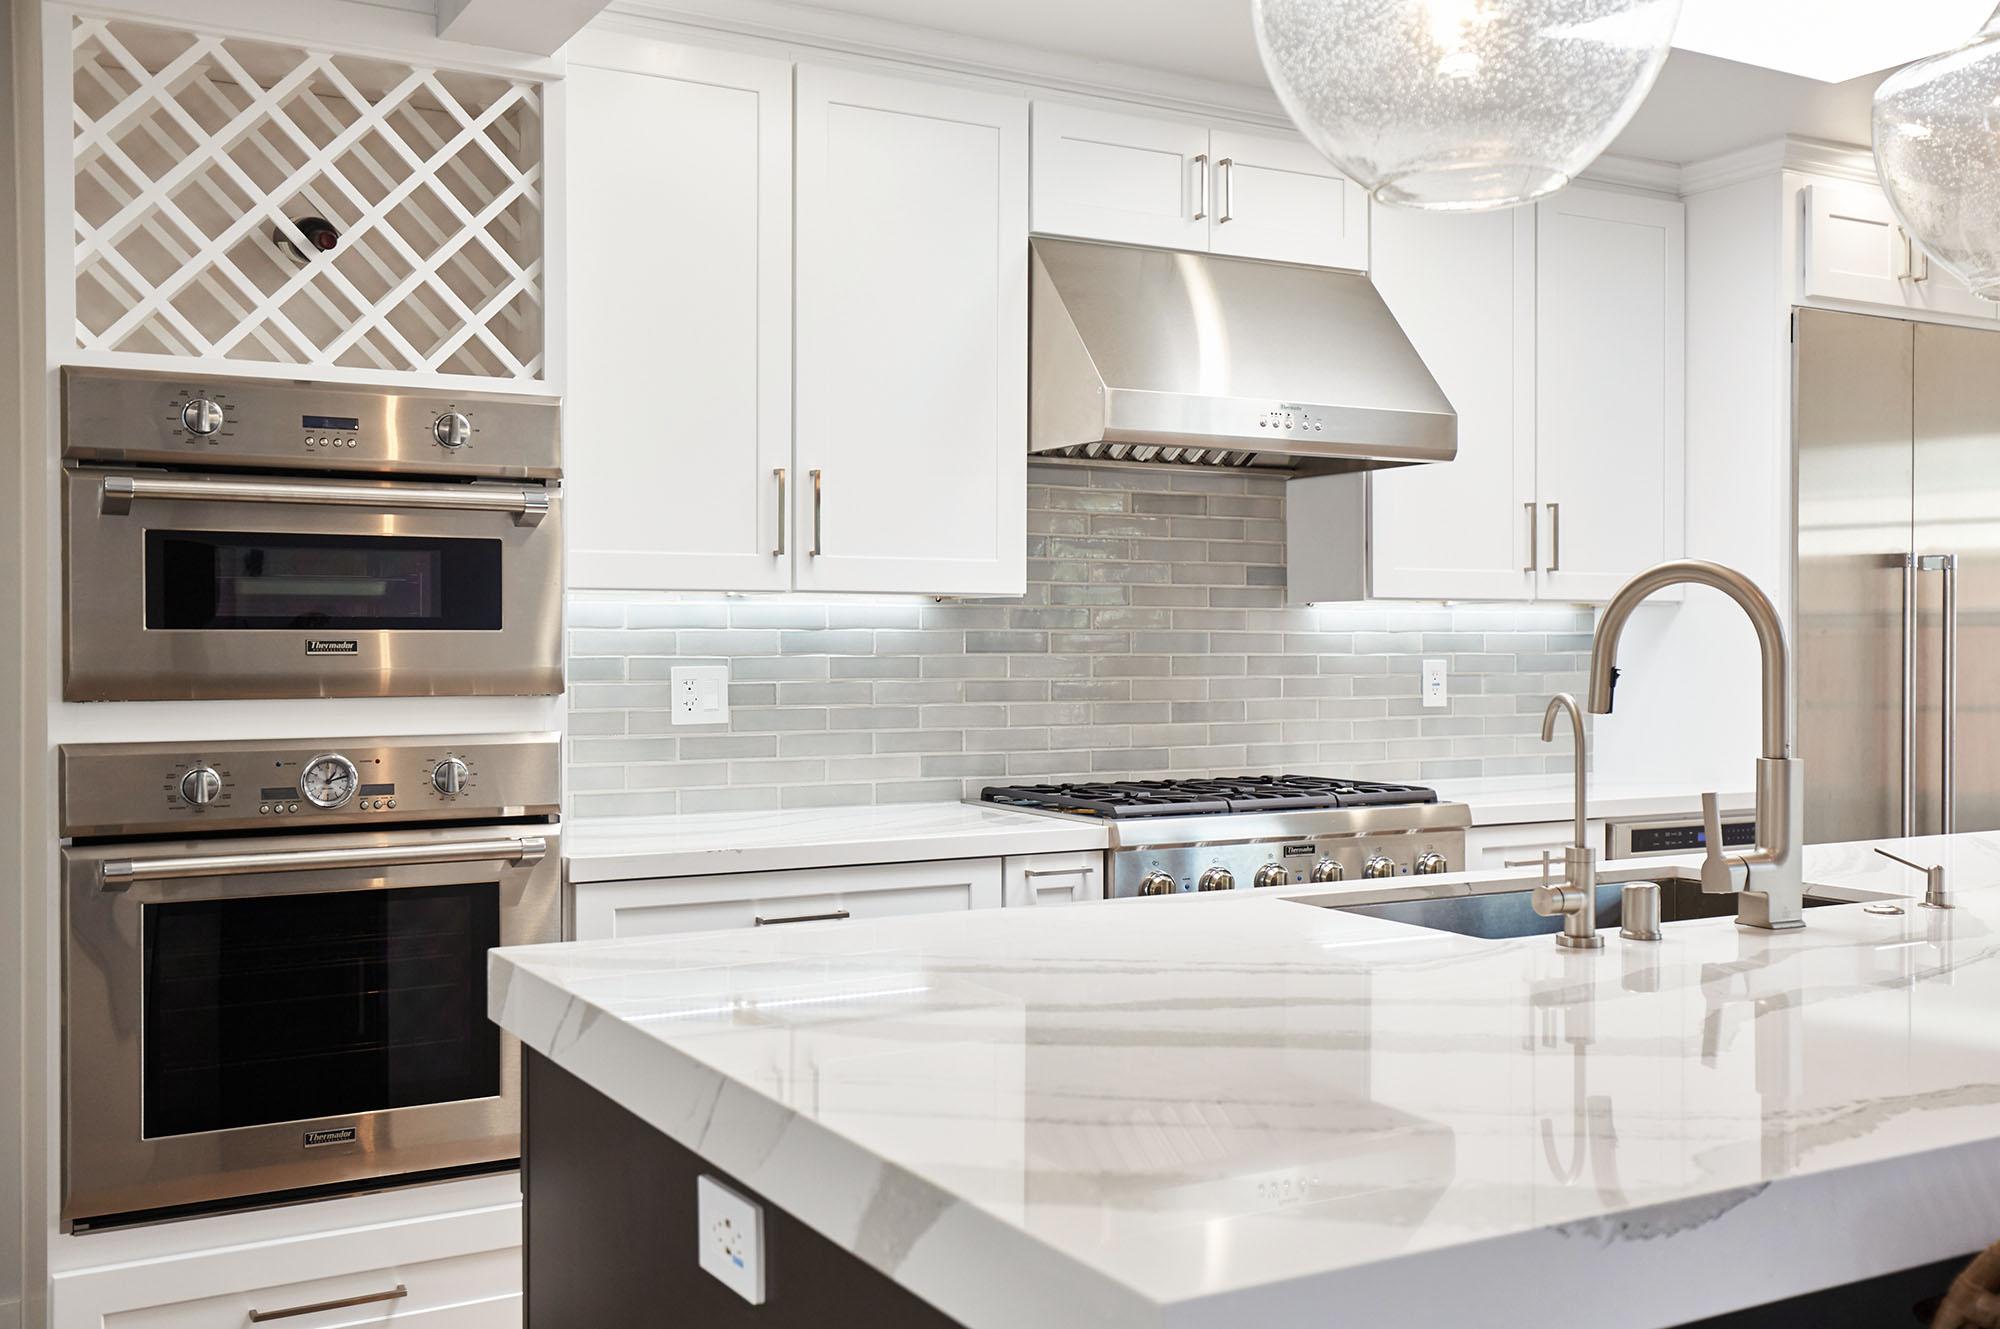 Studio City kitchen remodel 13 SMALL.jpg